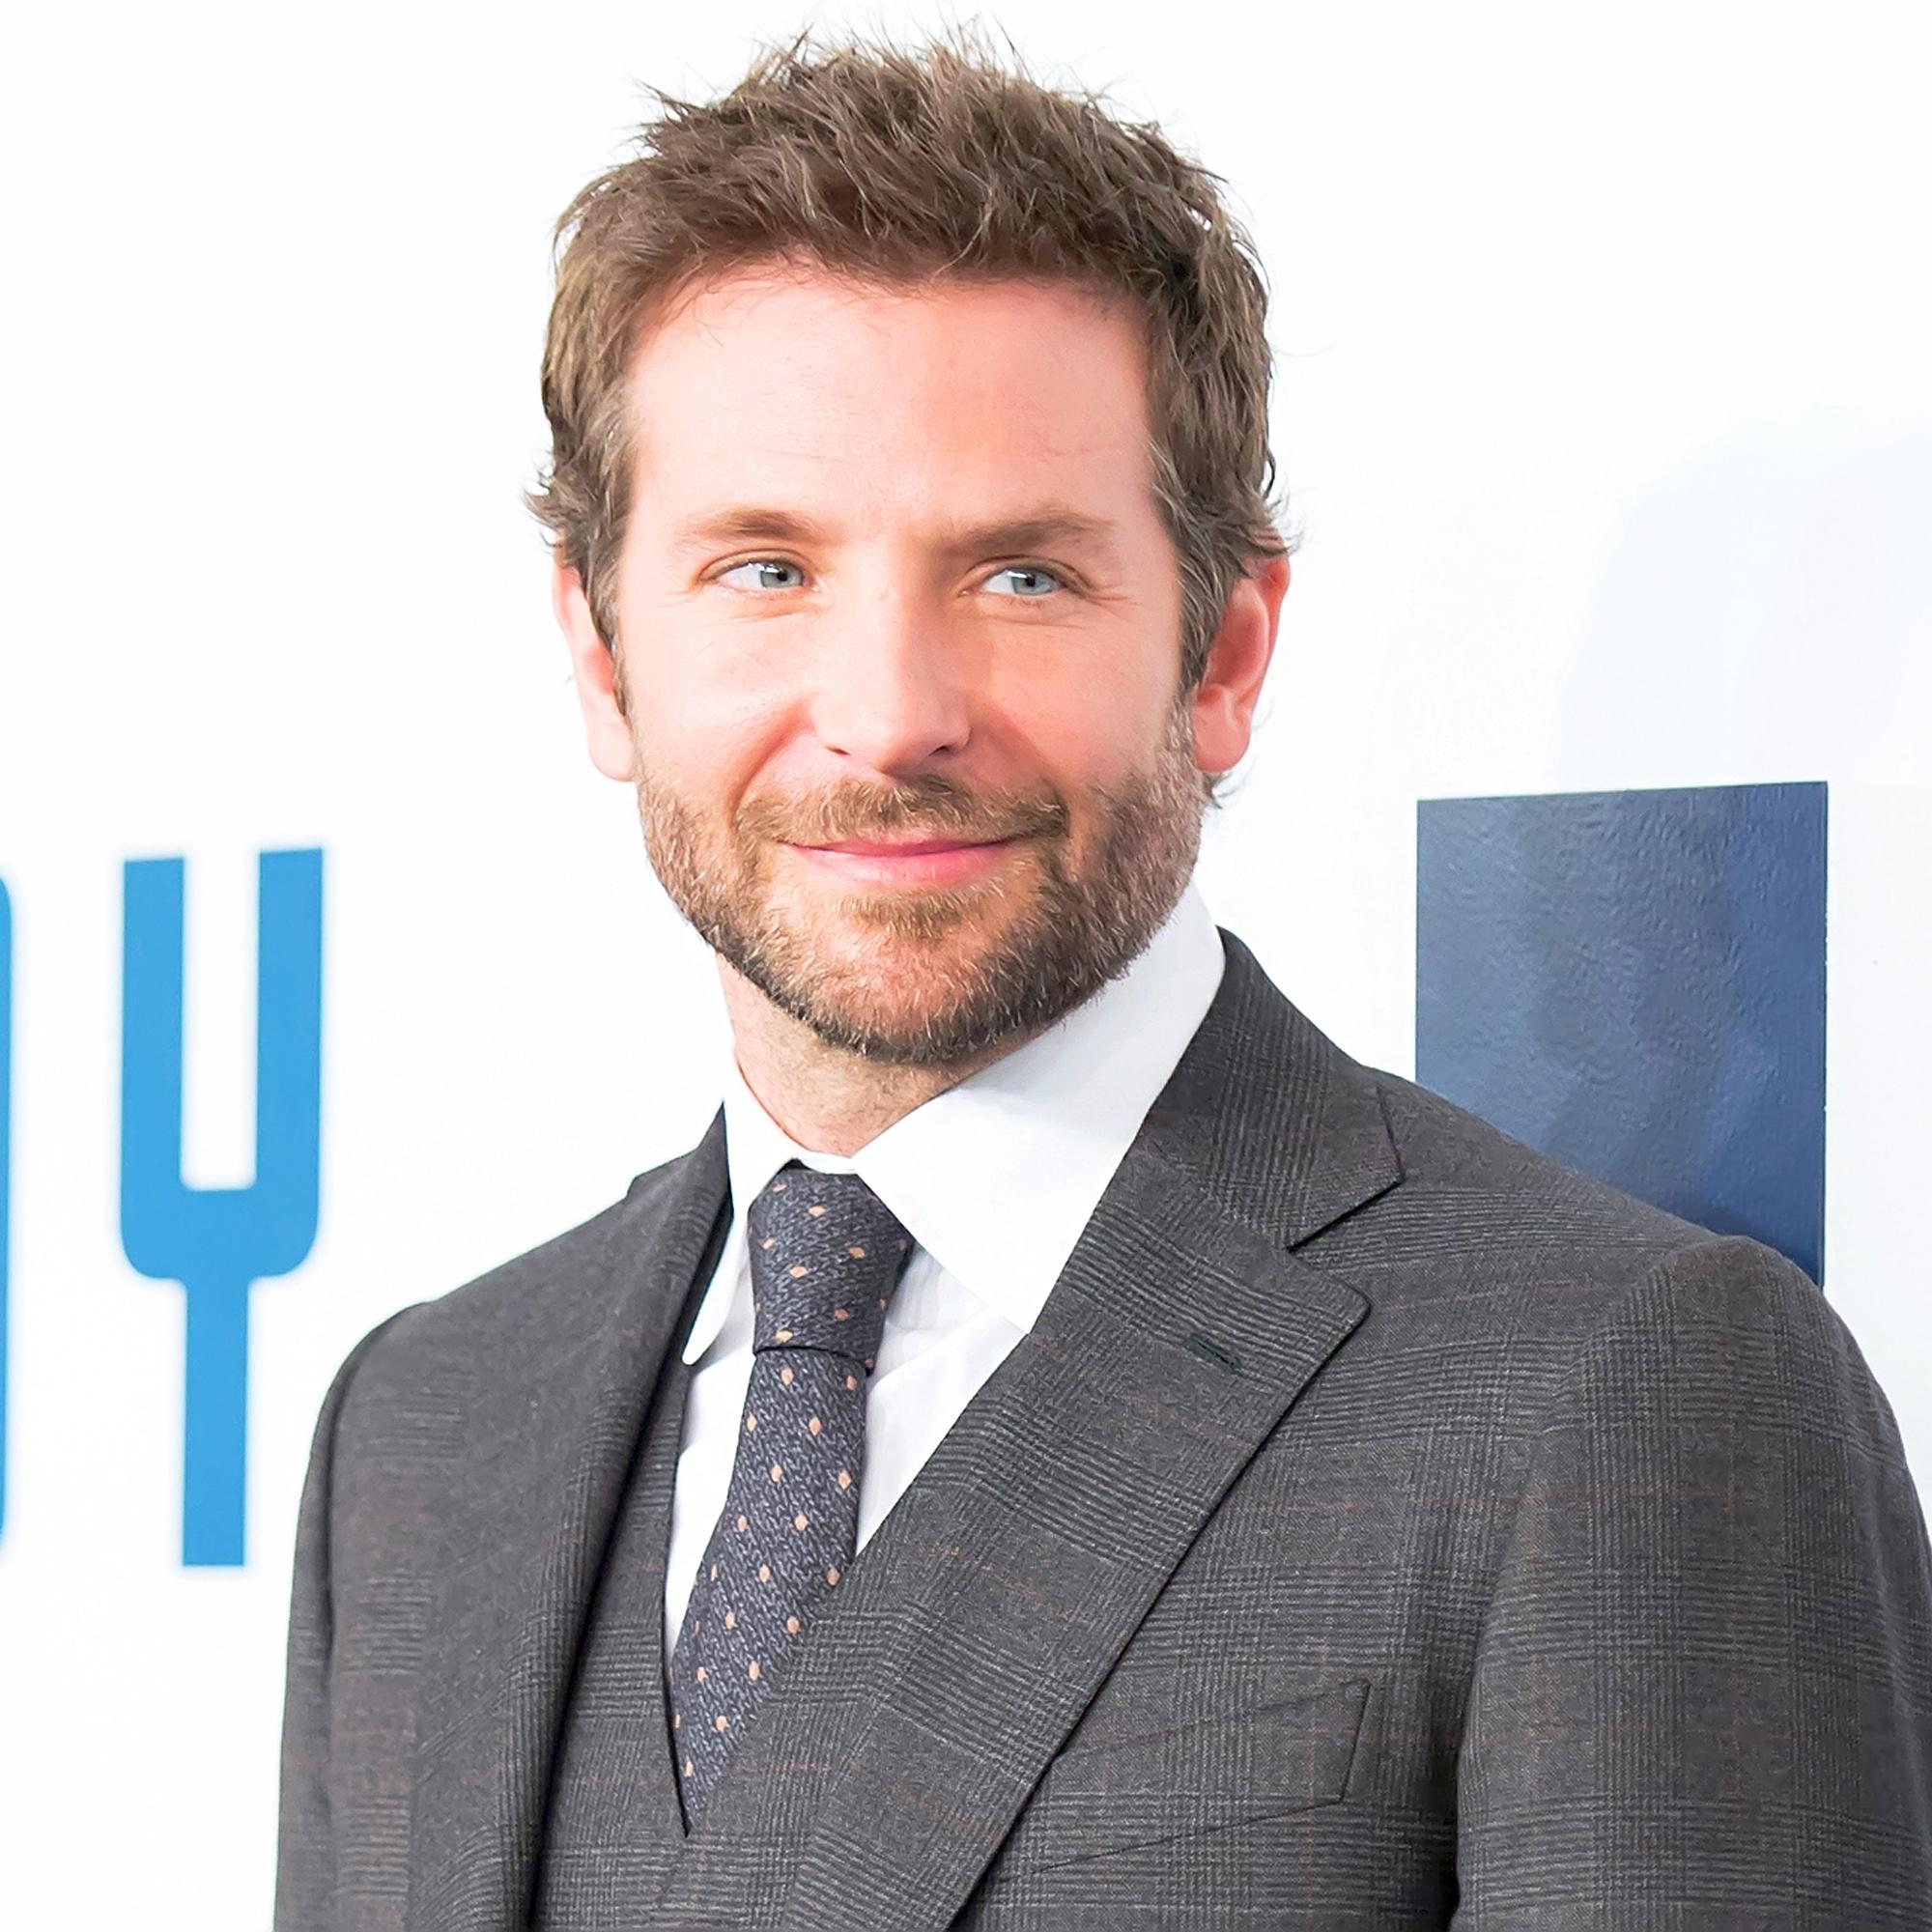 Bradley Cooper attends the 'Joy' New York premiere at Ziegfeld Theater in New York City.